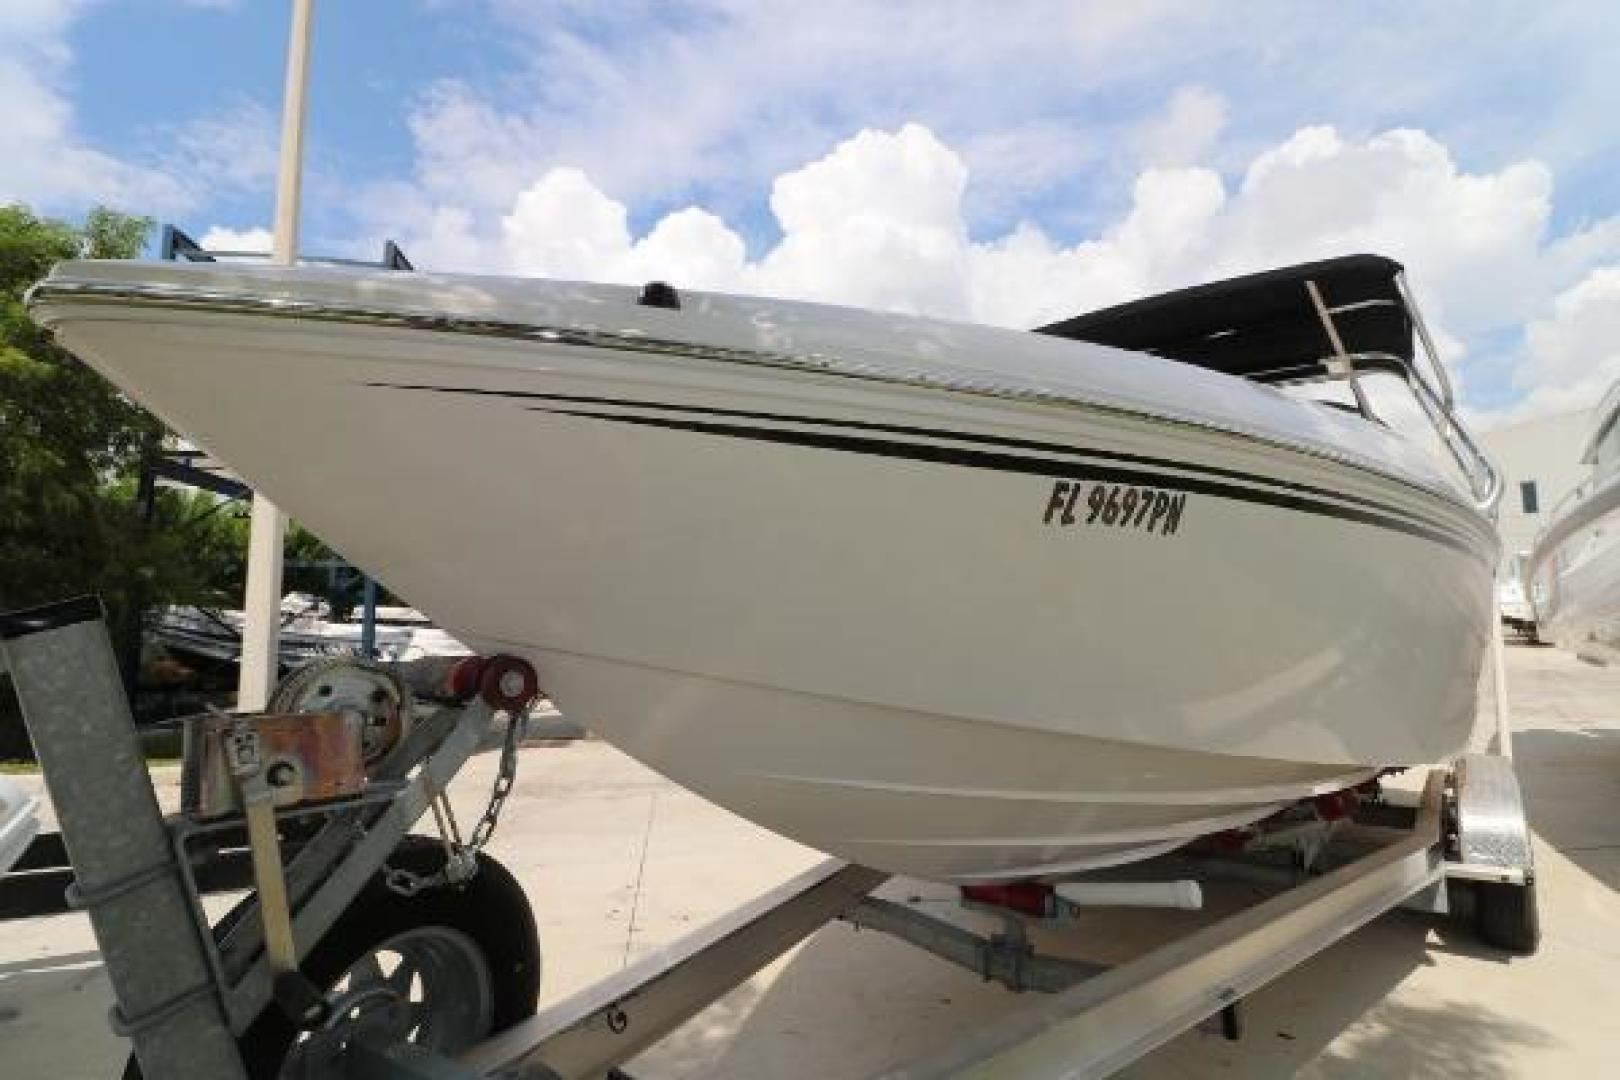 Baja-245 Performance 2014-Baja 245 Performance Fort Lauderdale-Florida-United States-1523816   Thumbnail